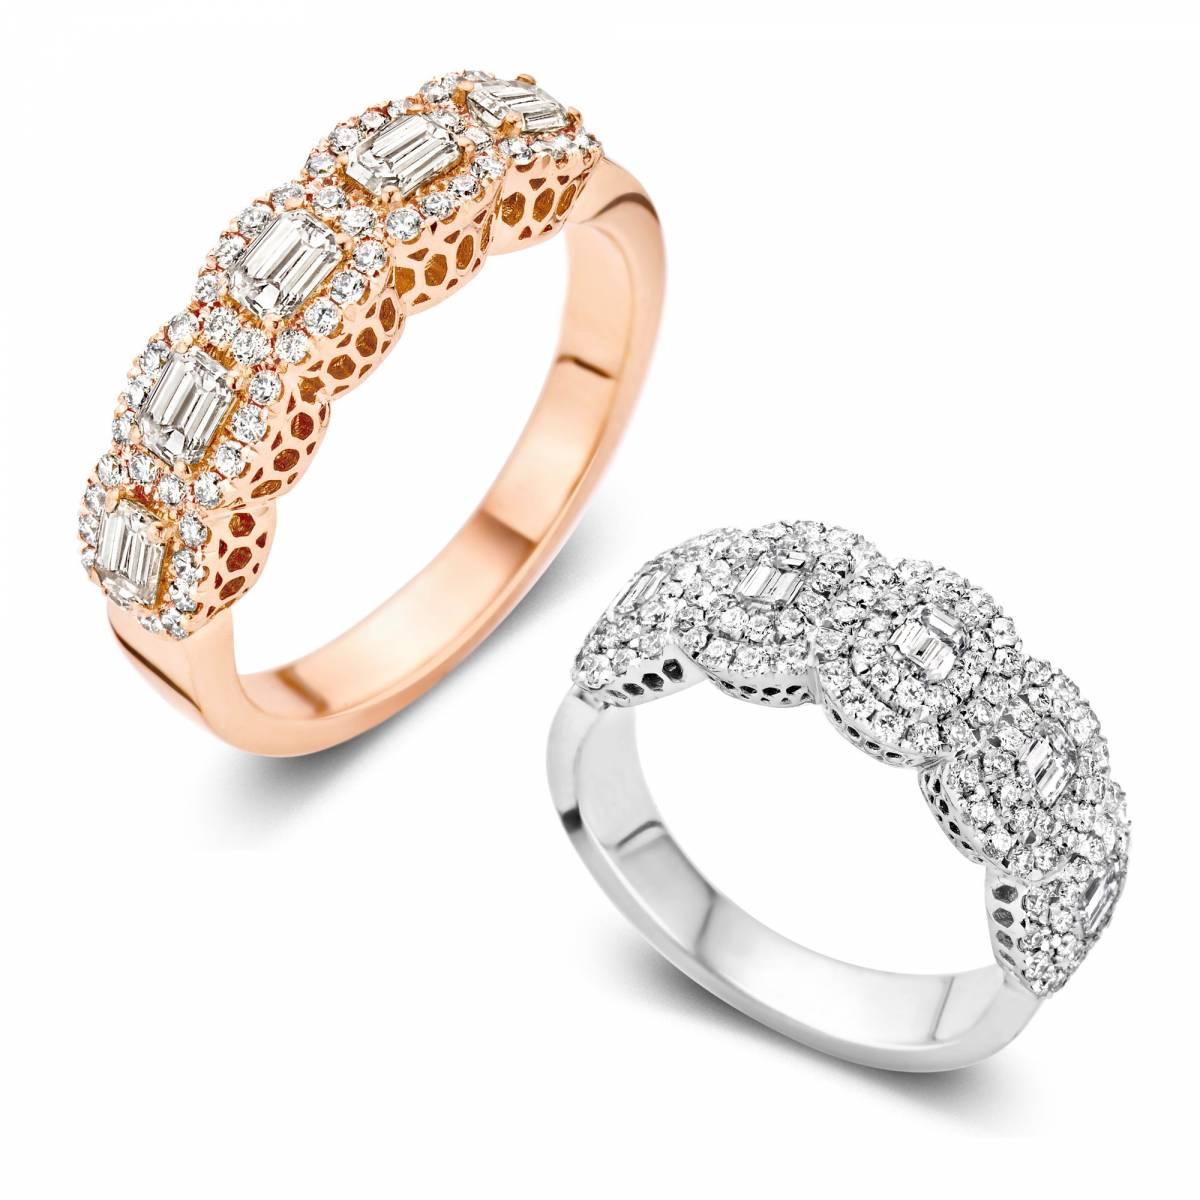 Juwelier Vandromme | Juwelen | House of Weddings copy